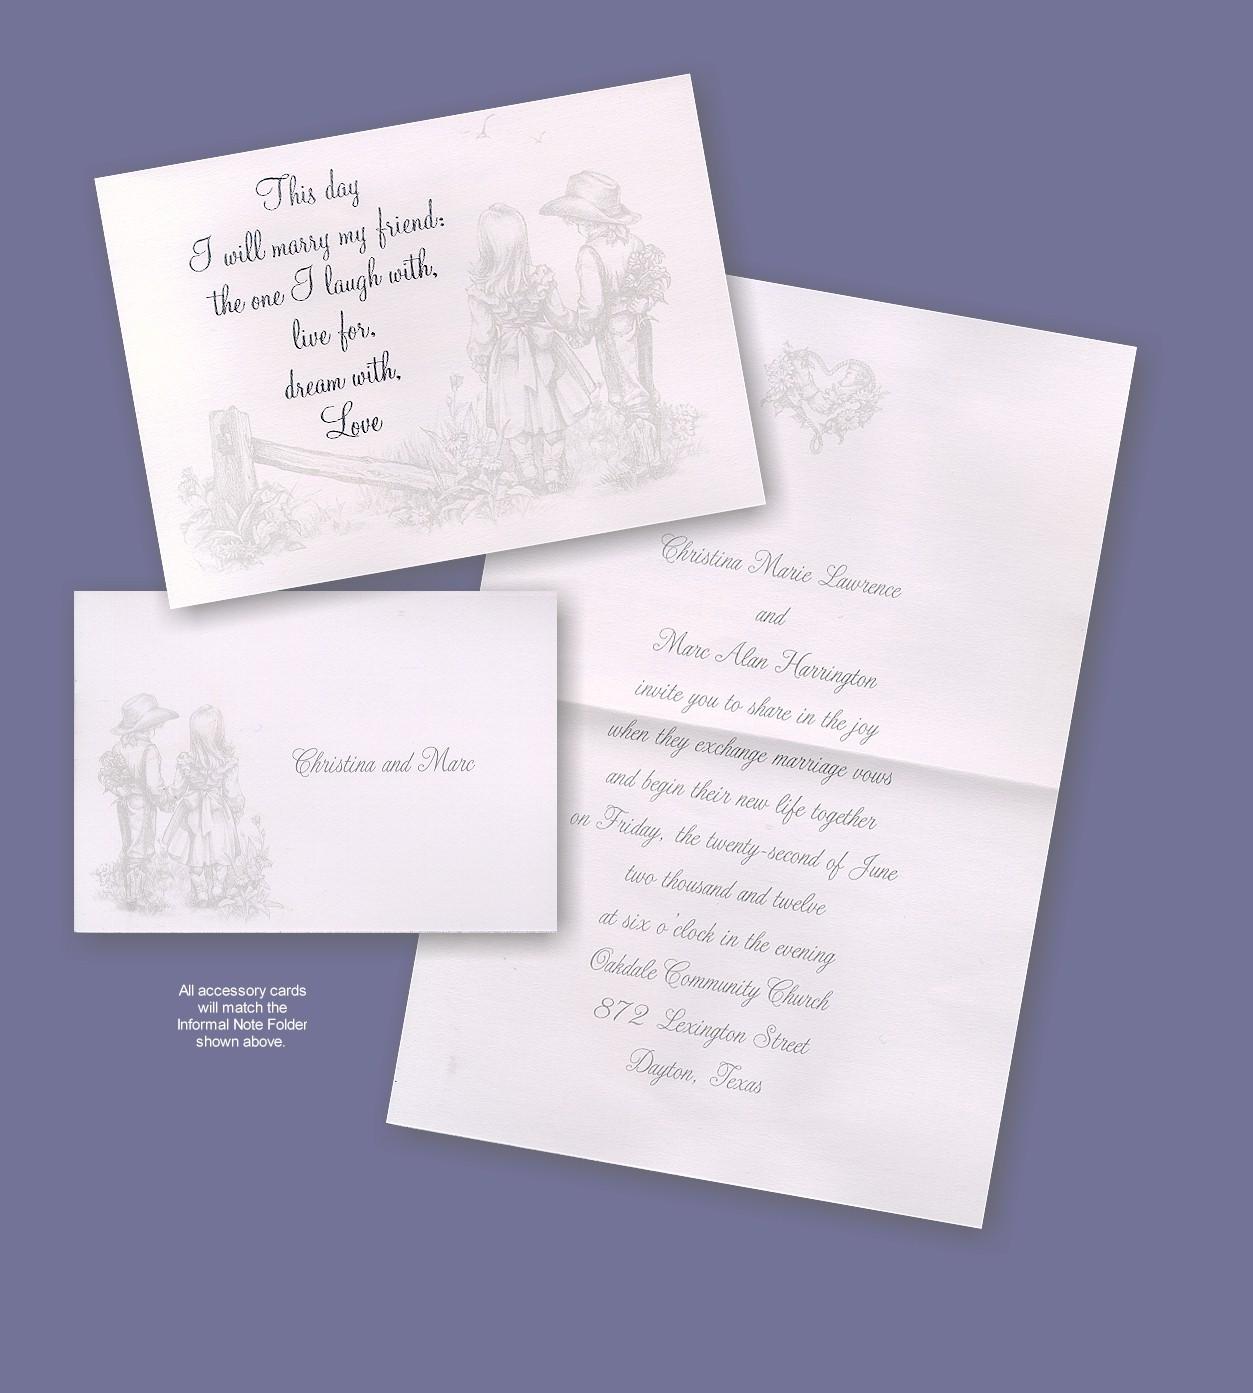 Silver Wedding Invitations: Silver Wedding Favors